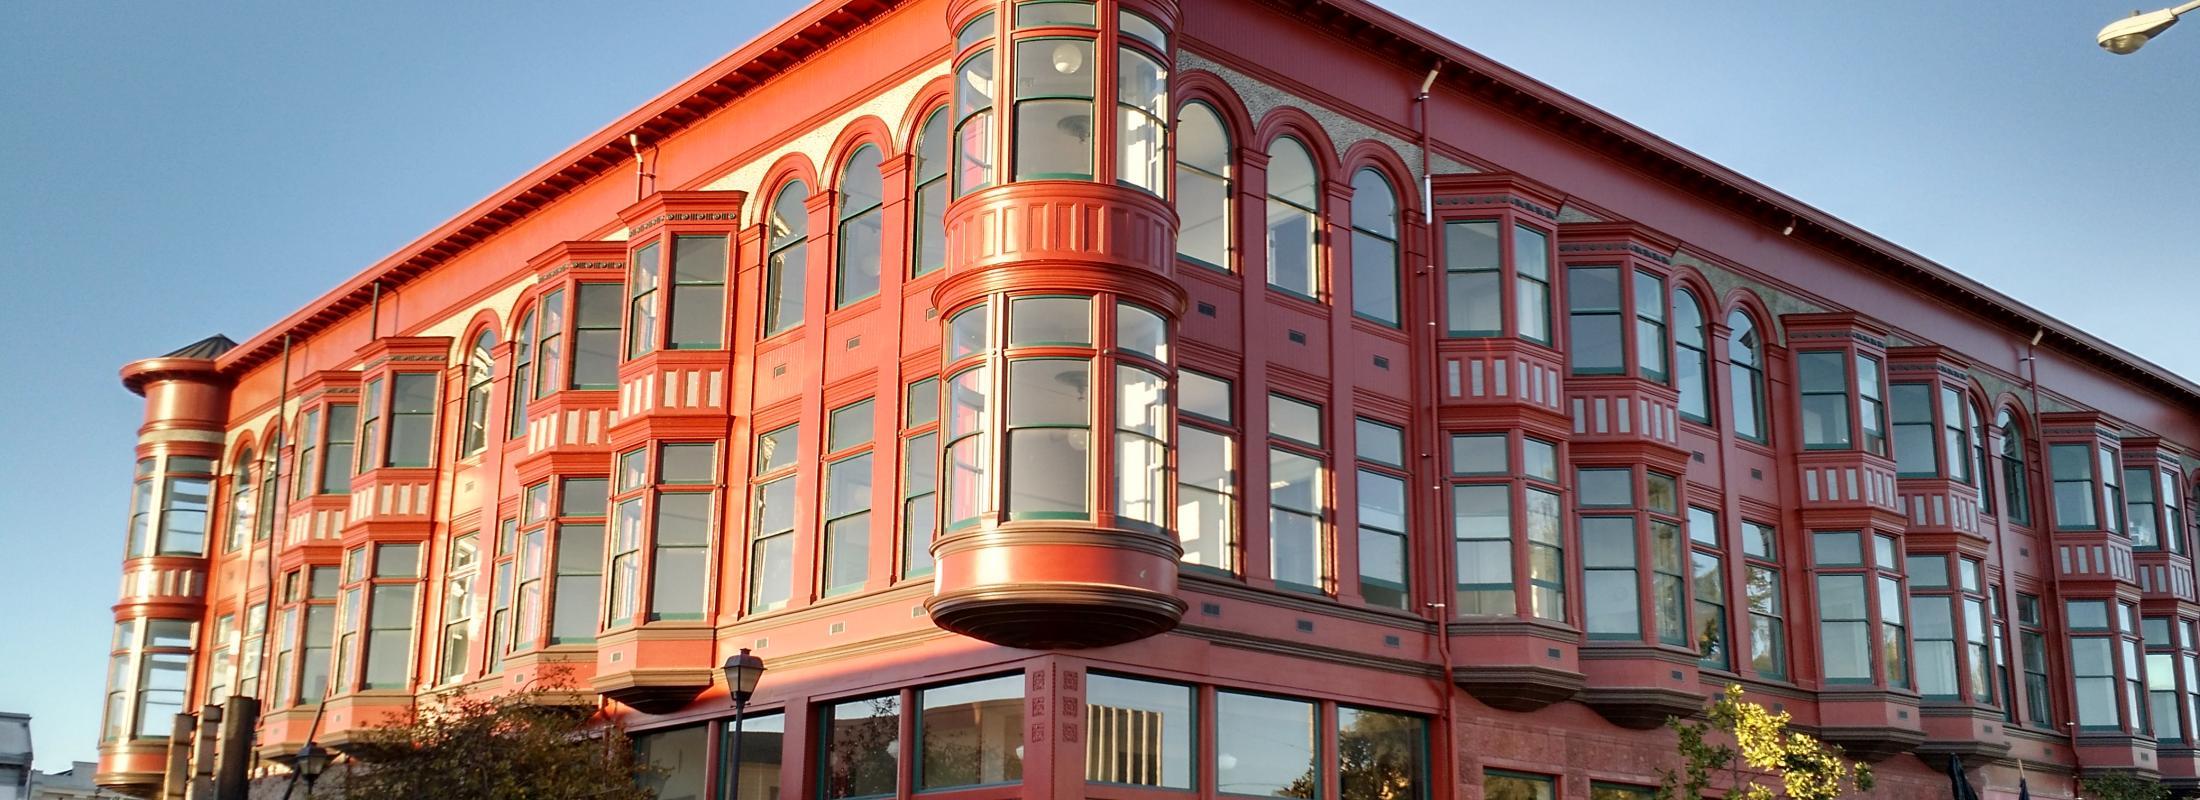 Carson Block Building